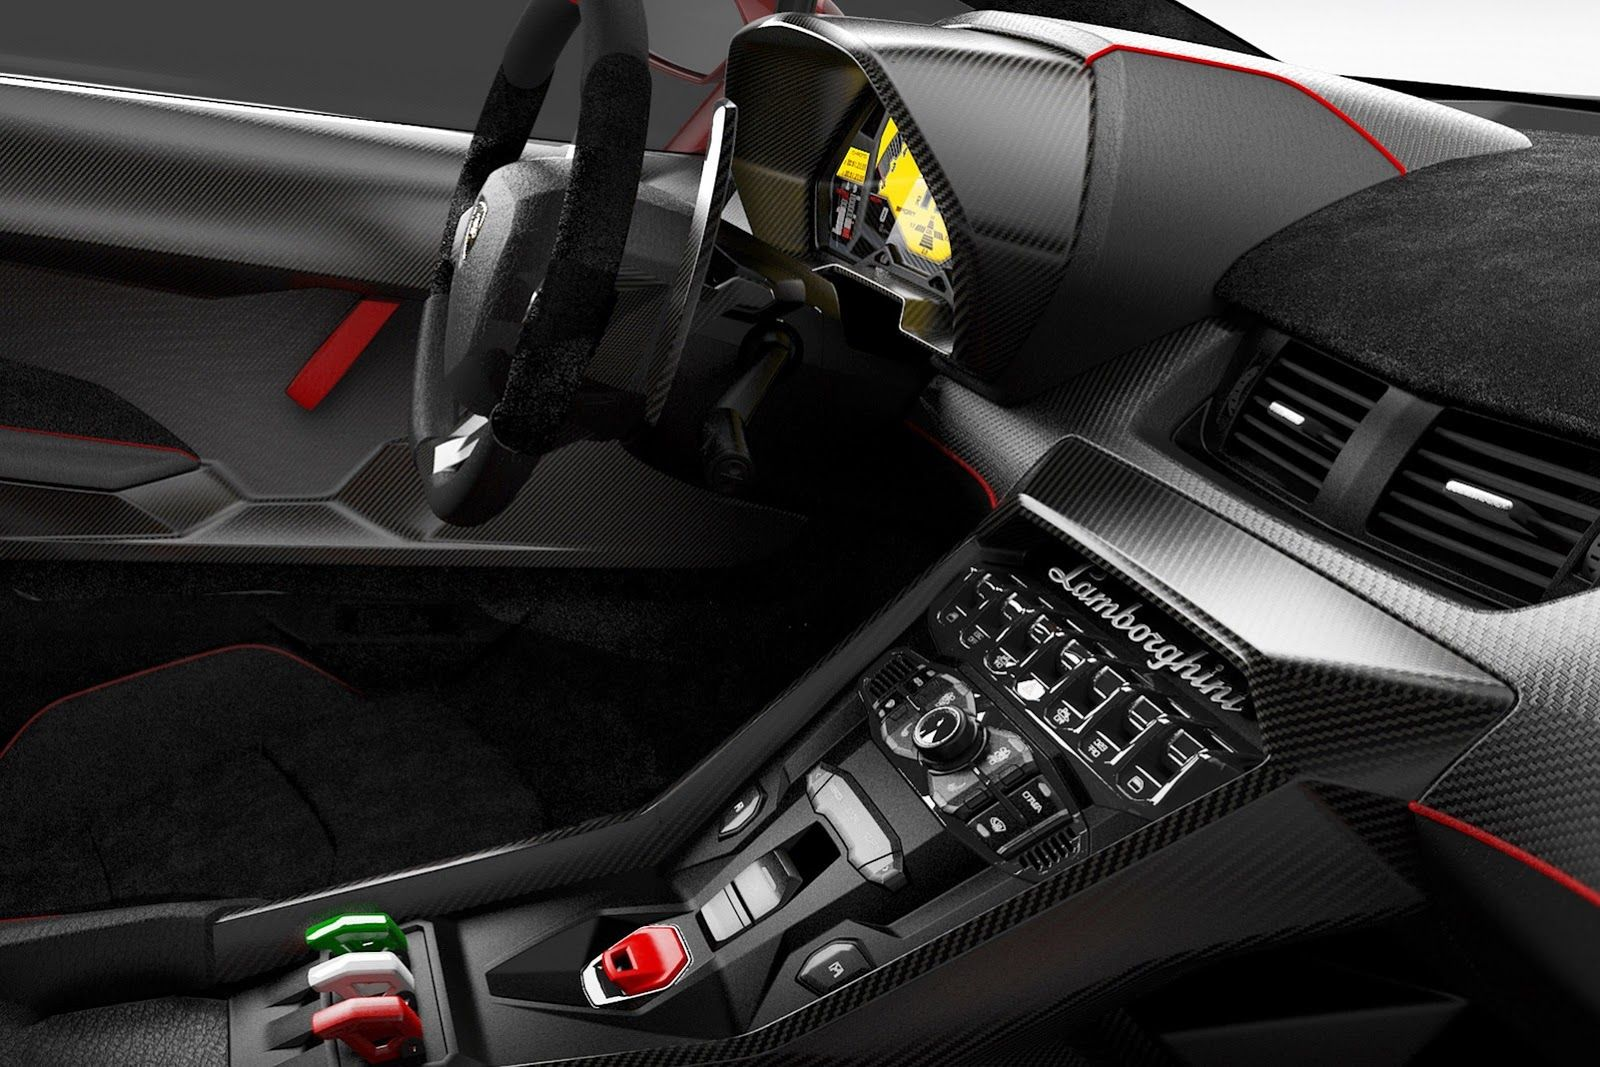 Lamborghini S Exotic Veneno Roadster Will Take You To 355km H Or